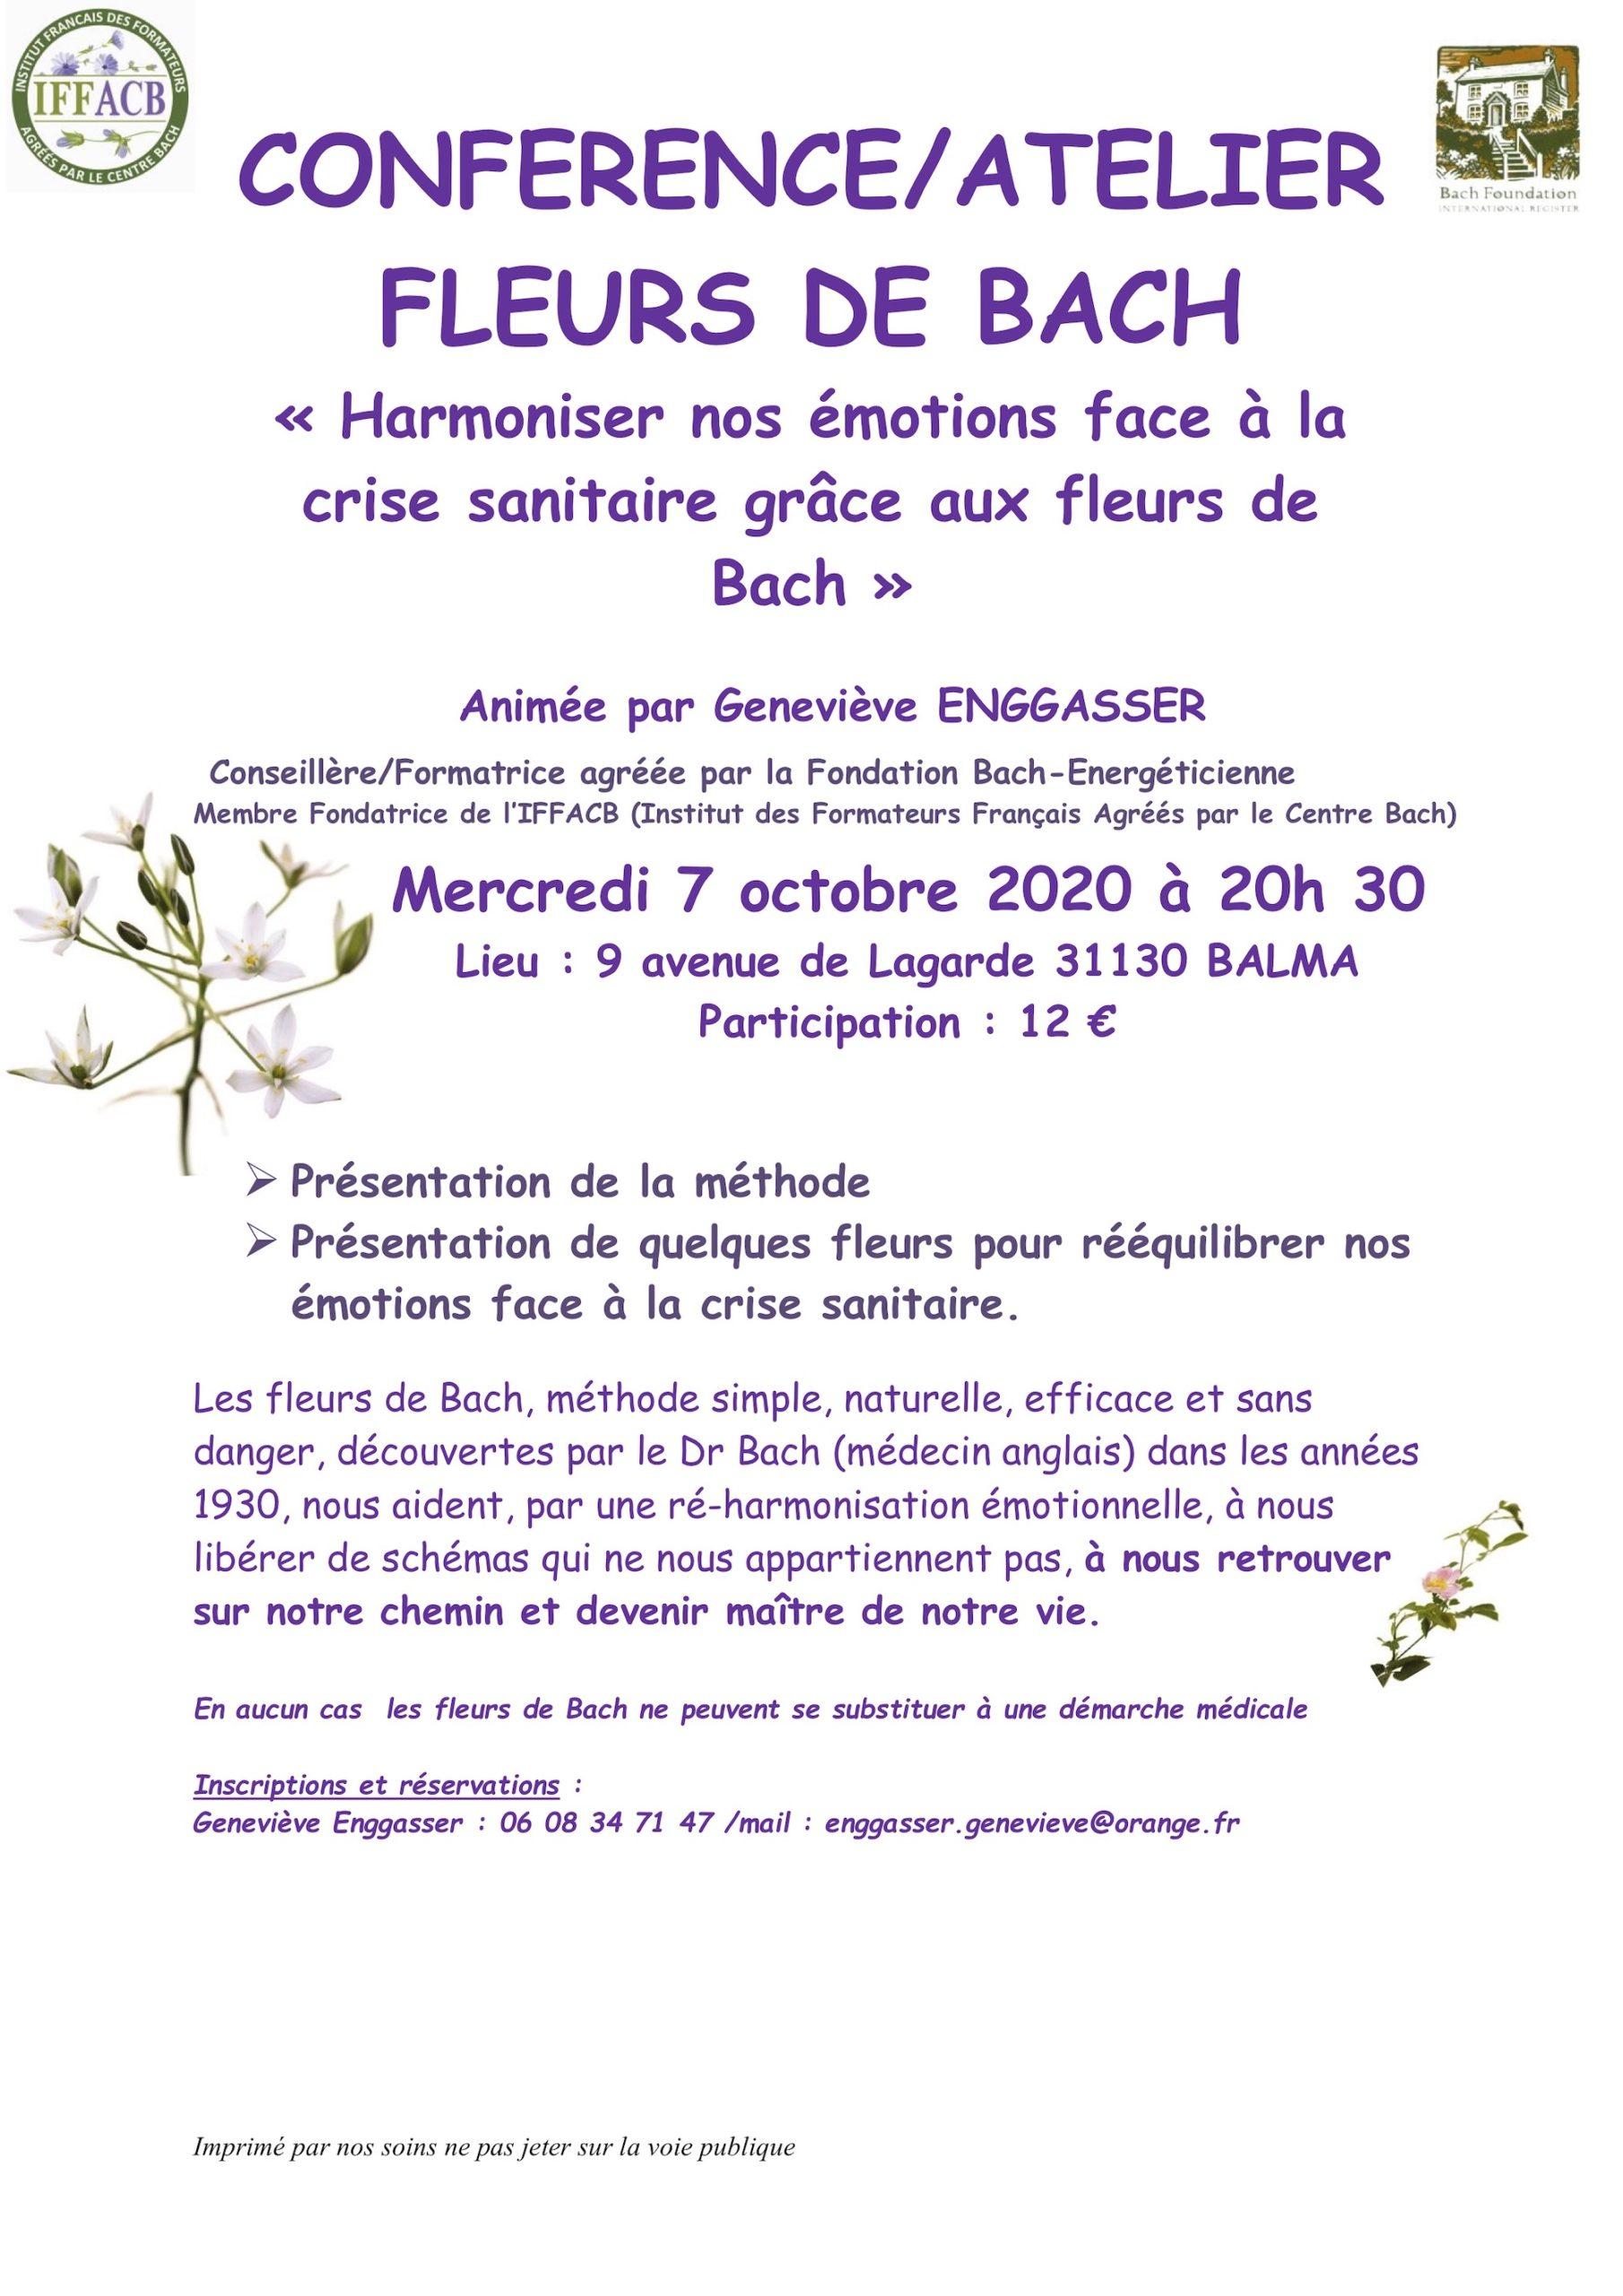 Conférence Fleurs de Bach Balma